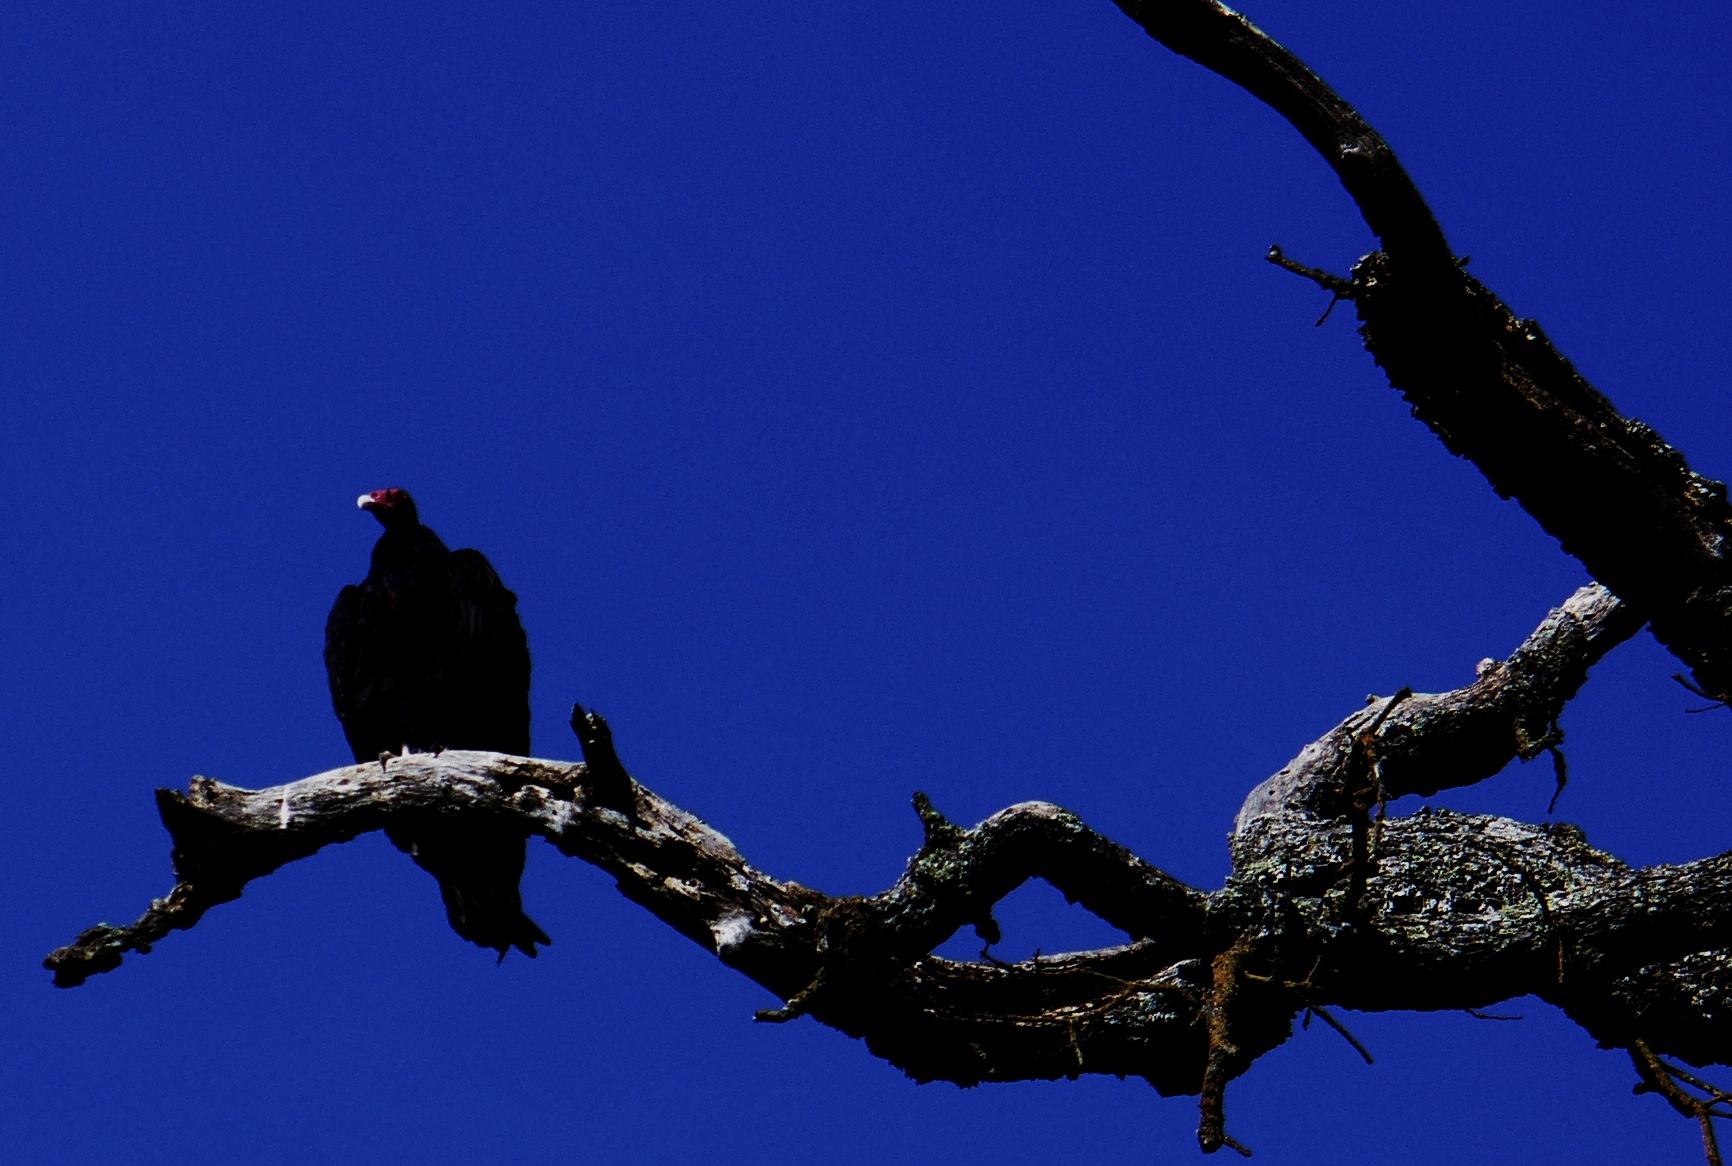 halloween-vulture-dark-20191026-25